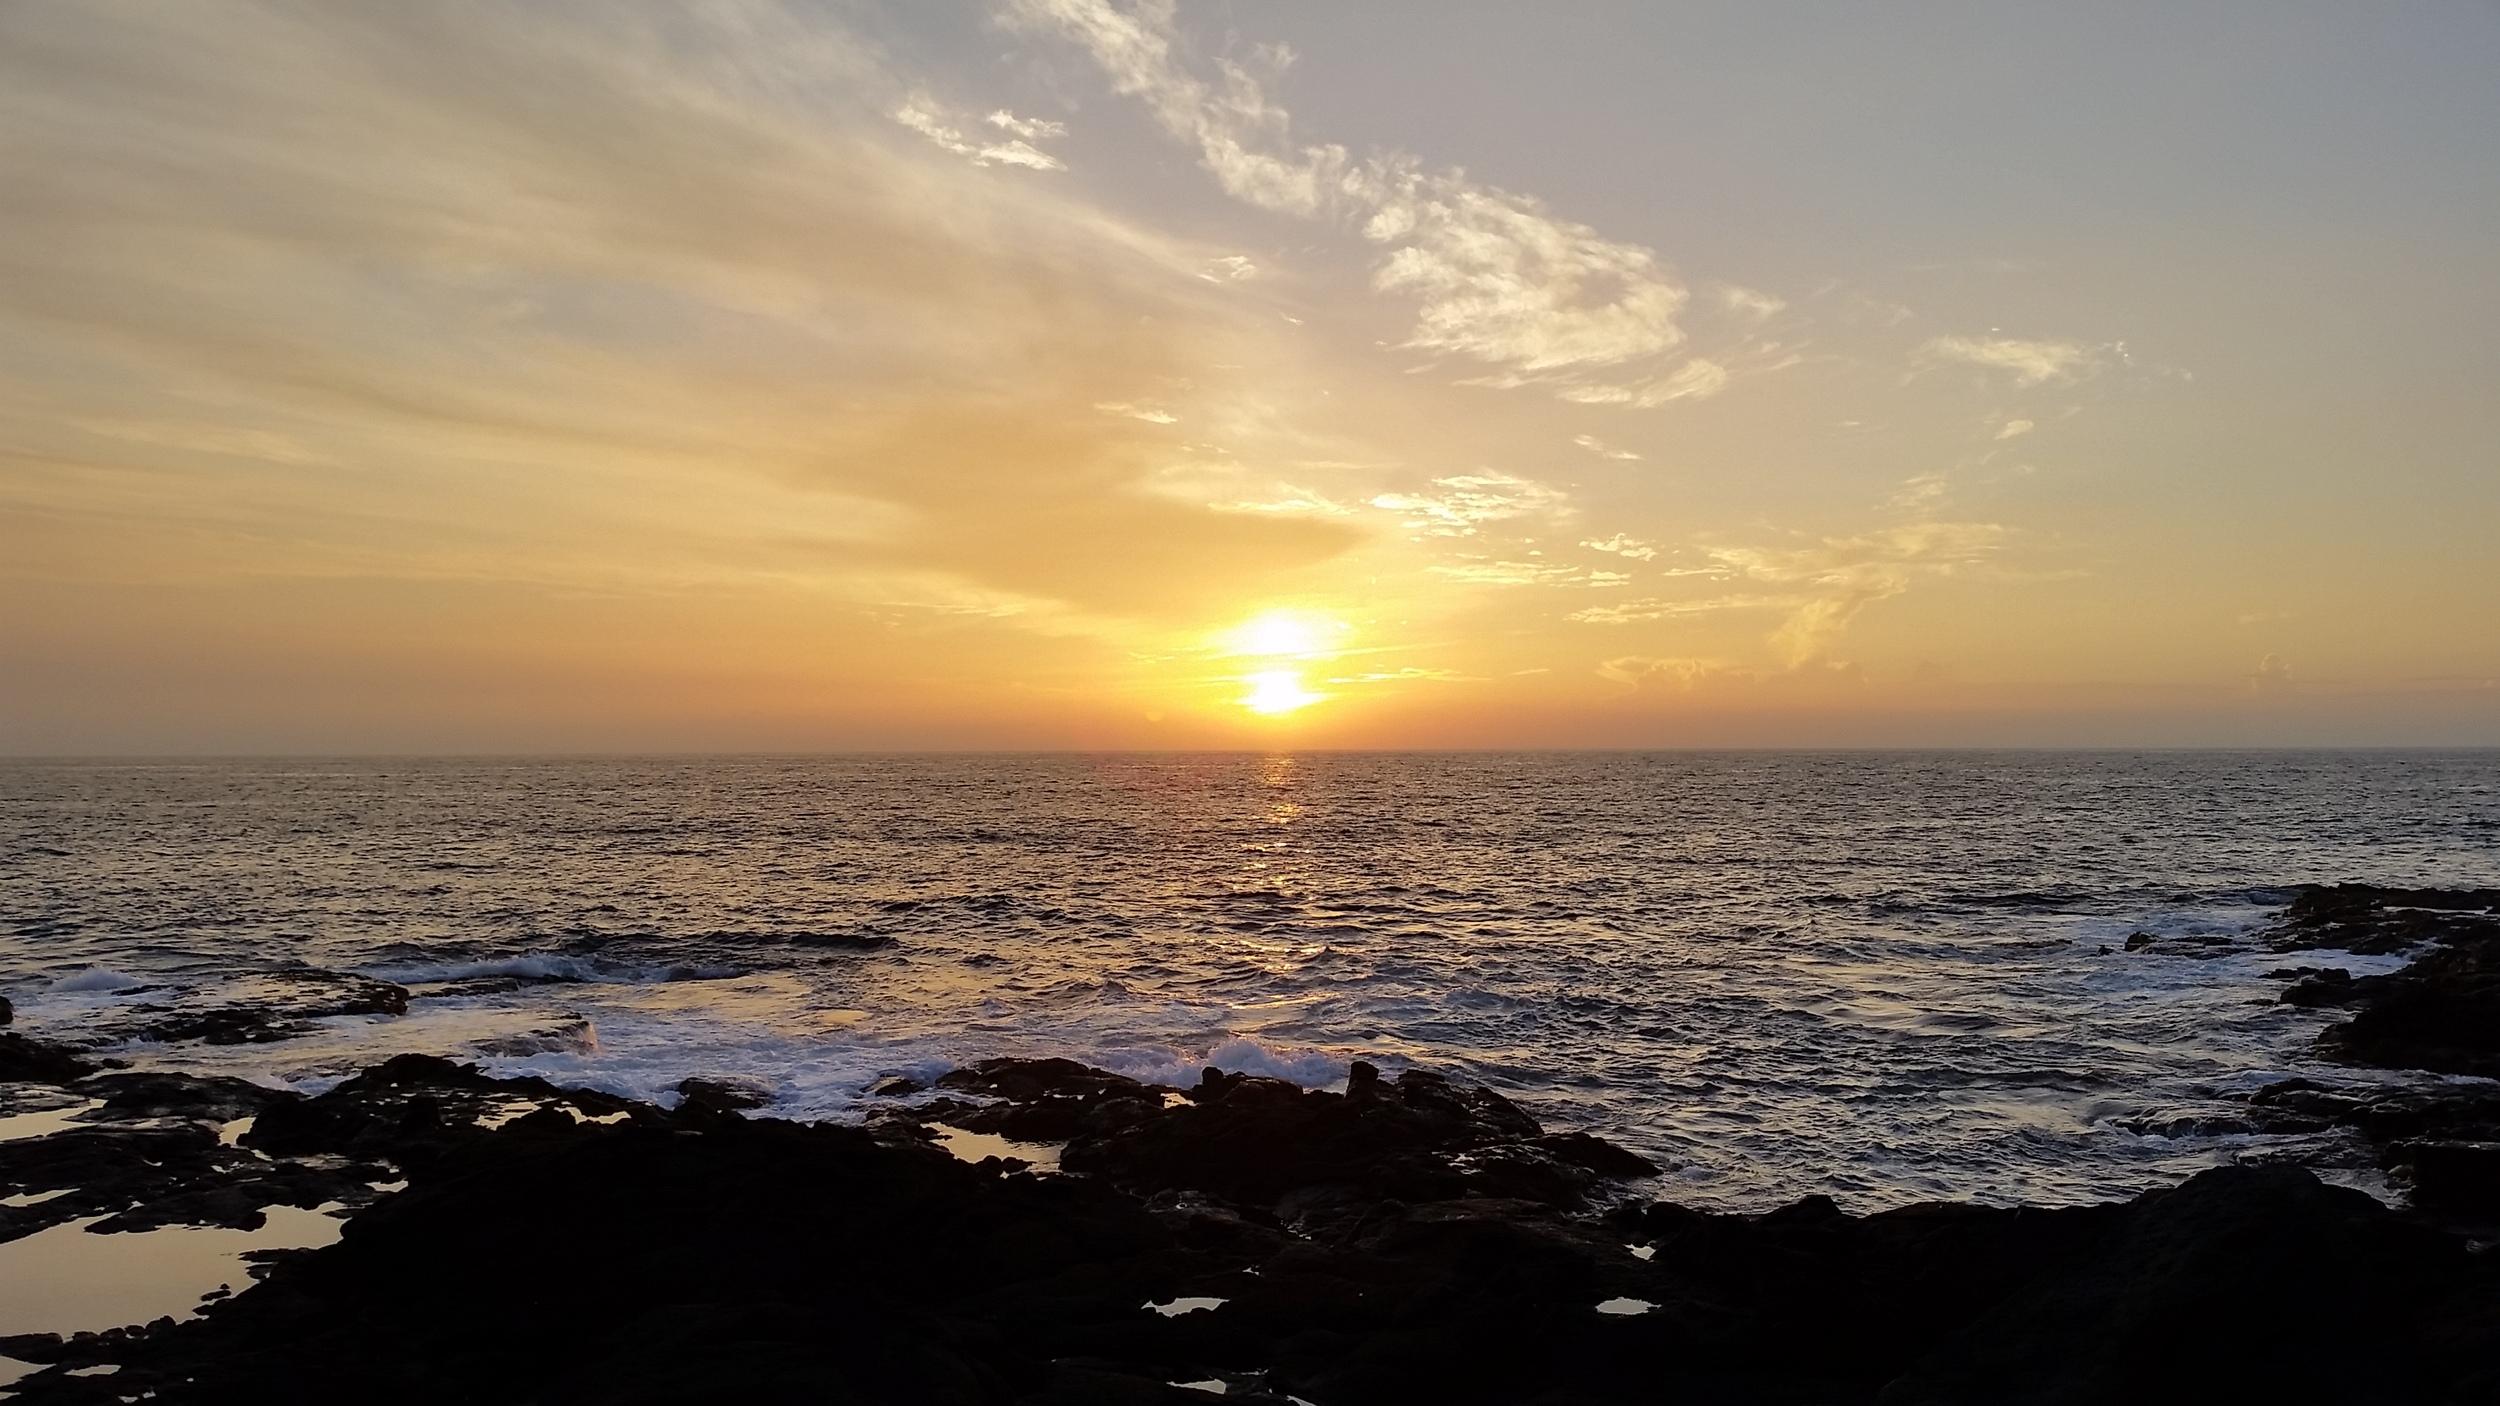 Another Brooke sunset shot.